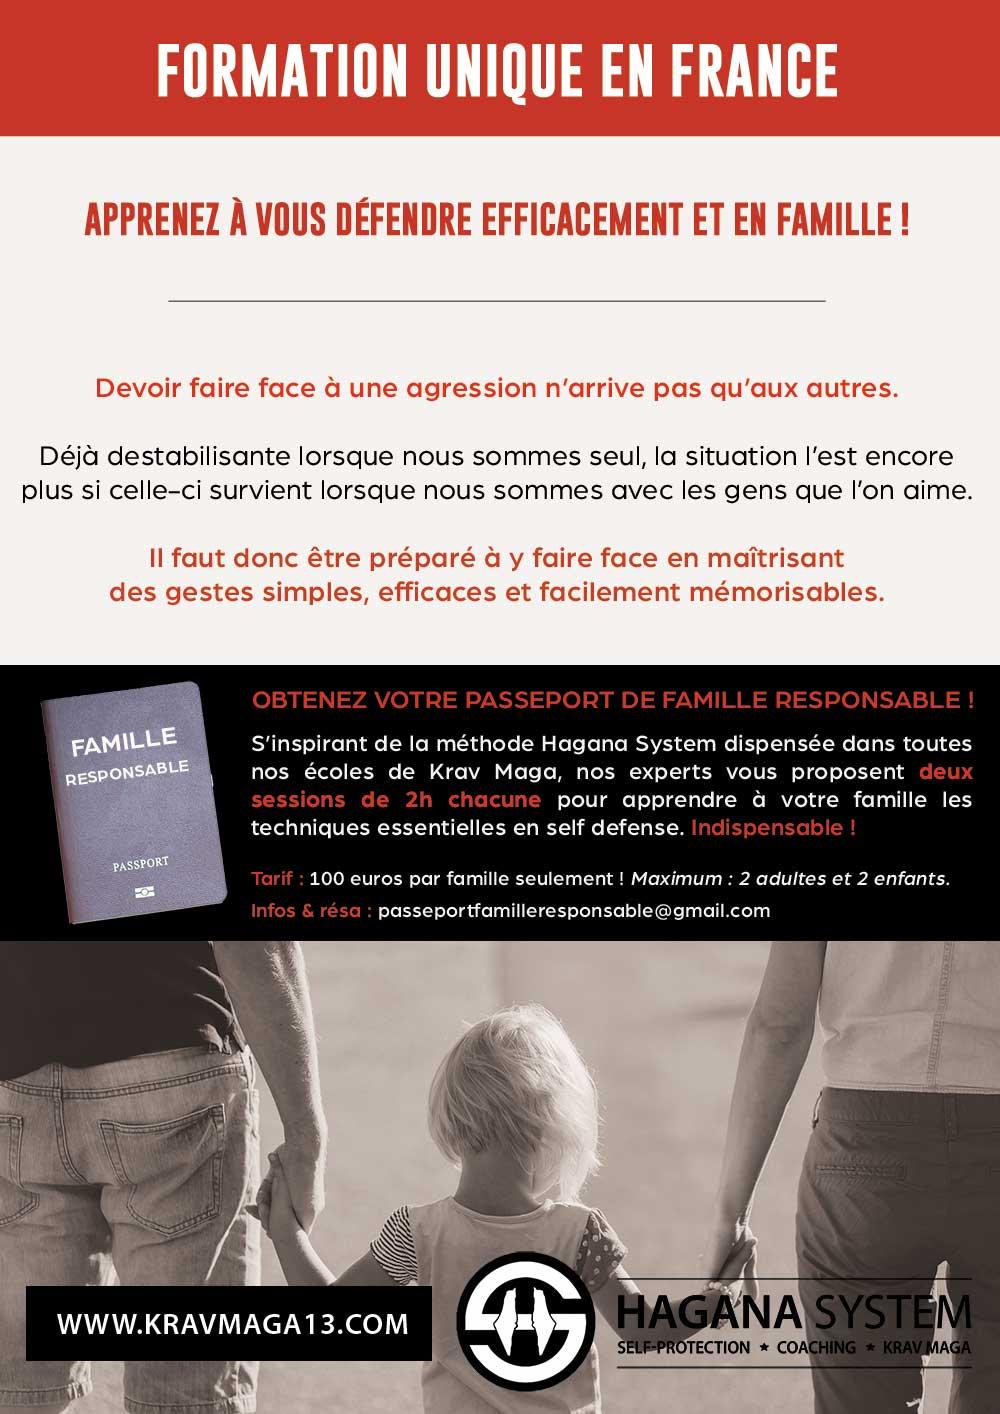 affiche-stage-krav-maga-hagana-system-brevet-self-defense-famille-5 ...